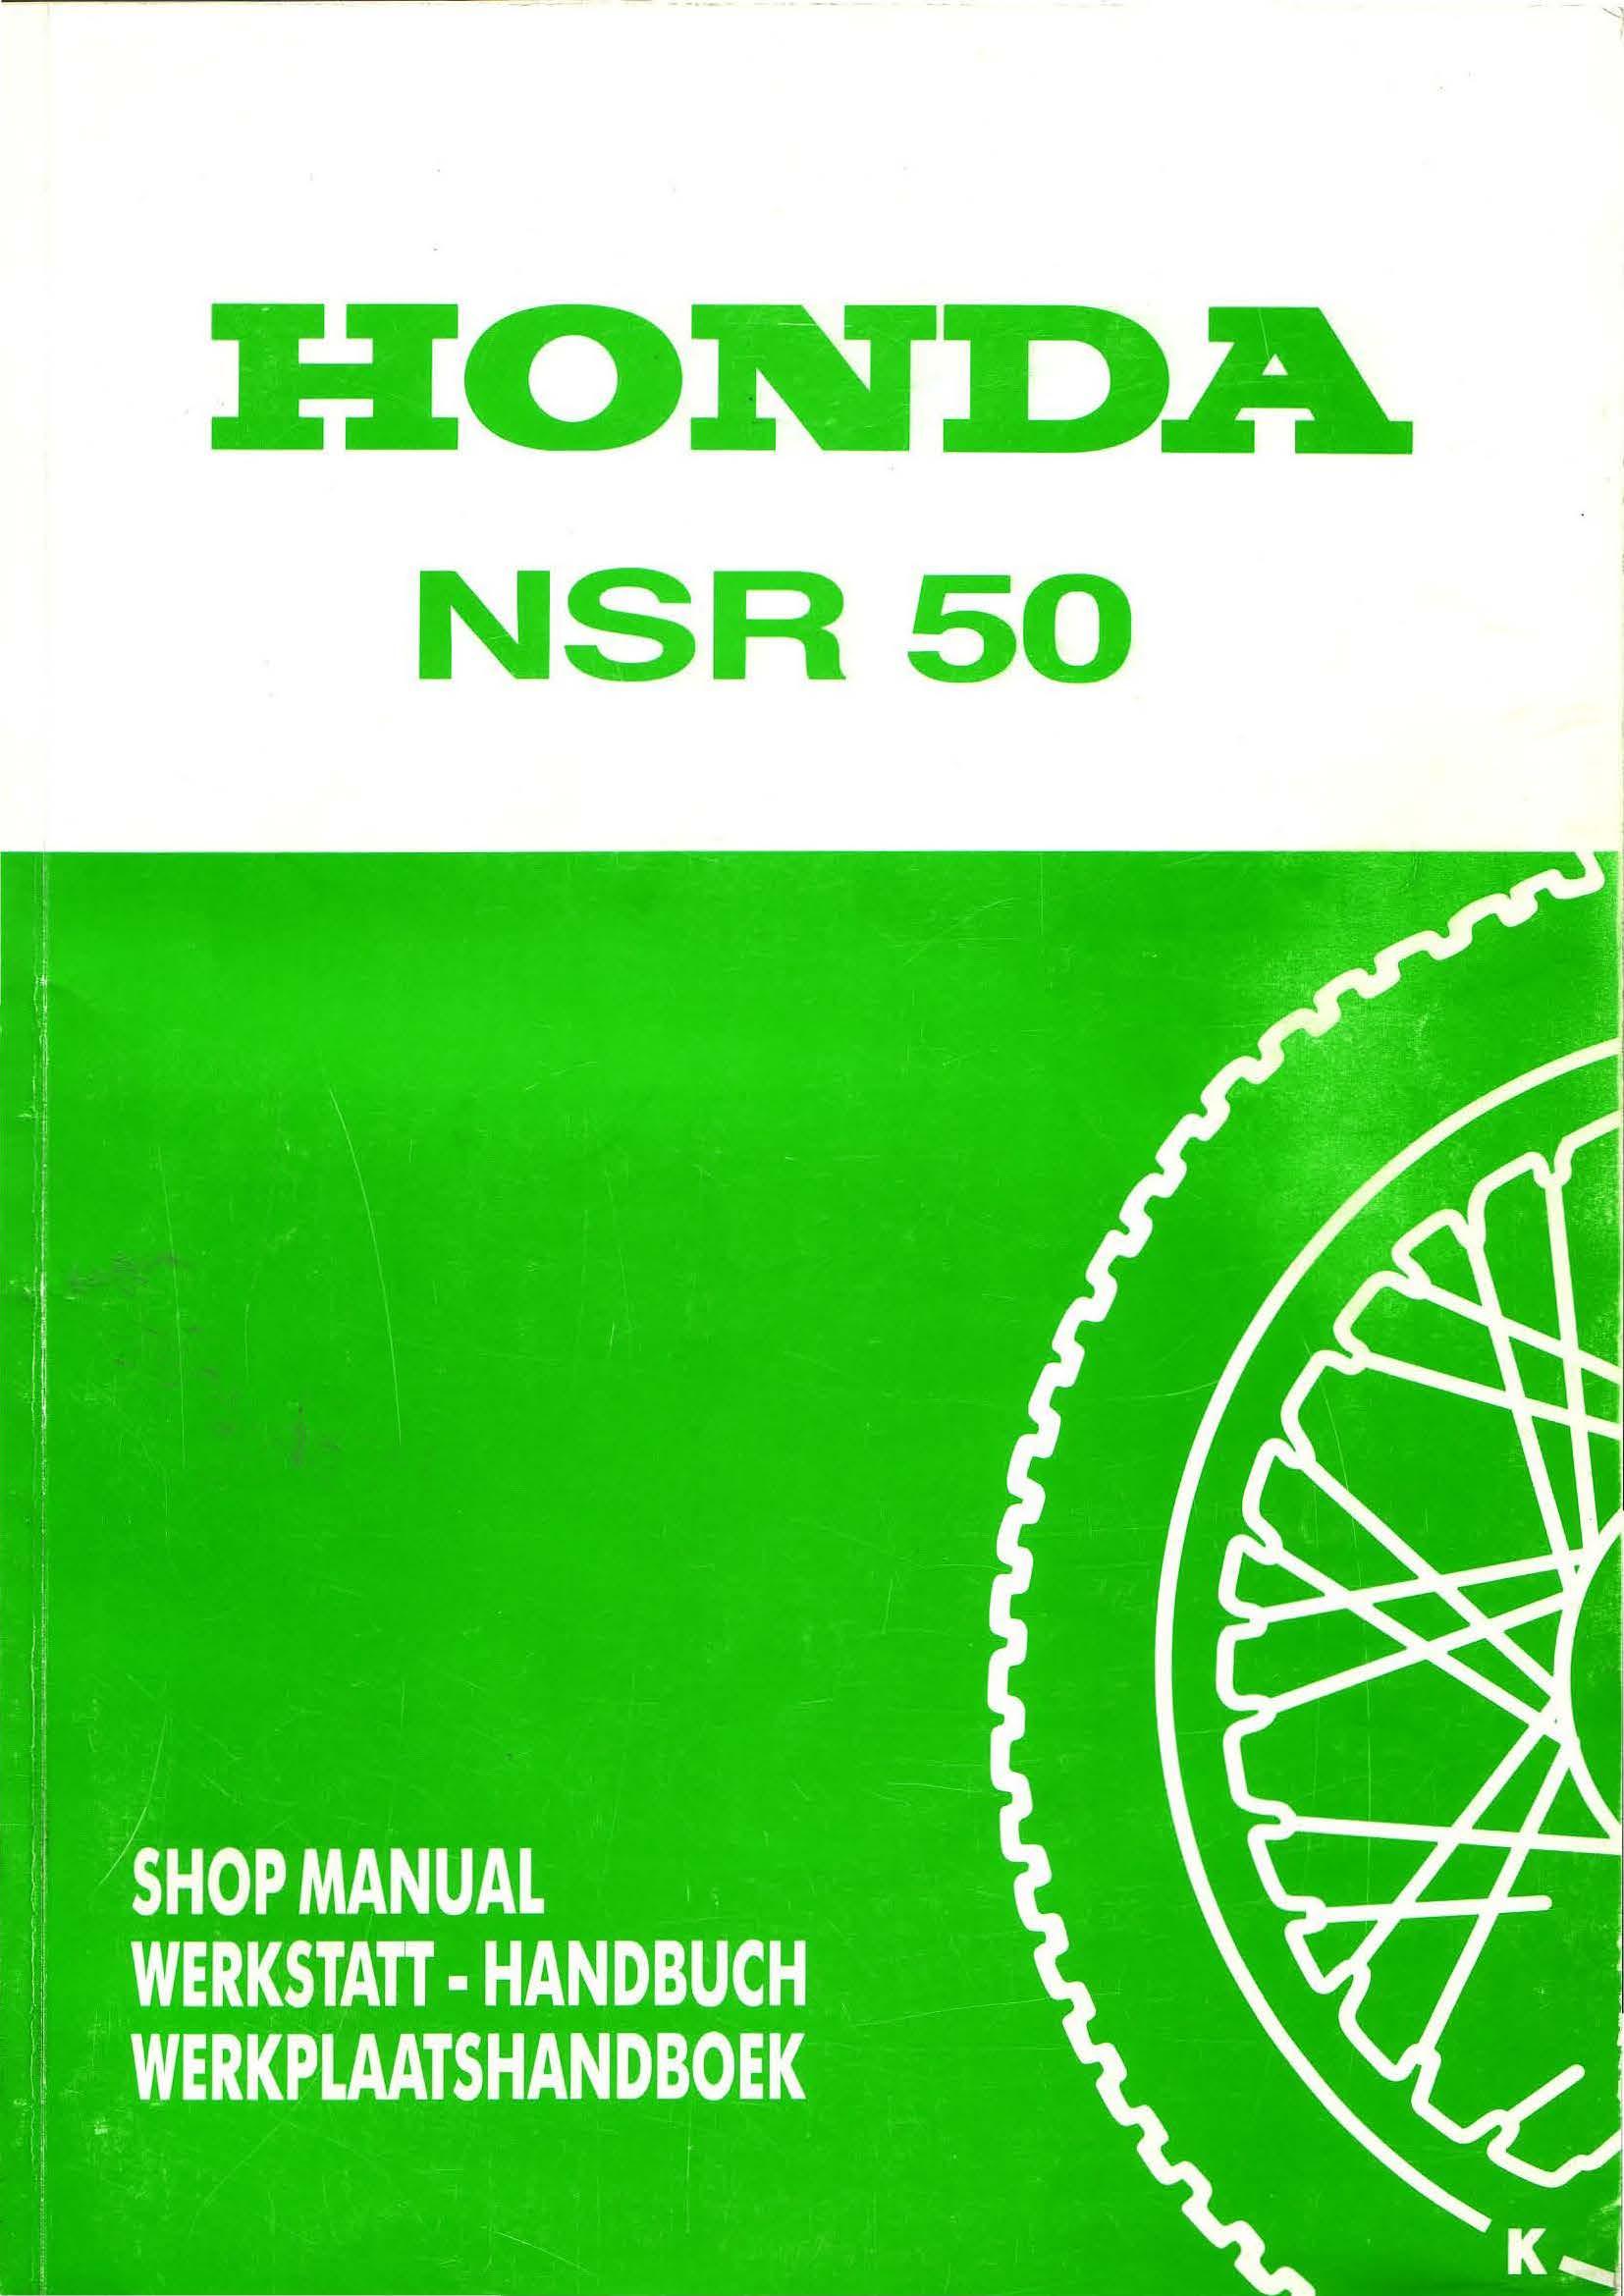 Workshop manual for Honda NSR50 (Dutch)